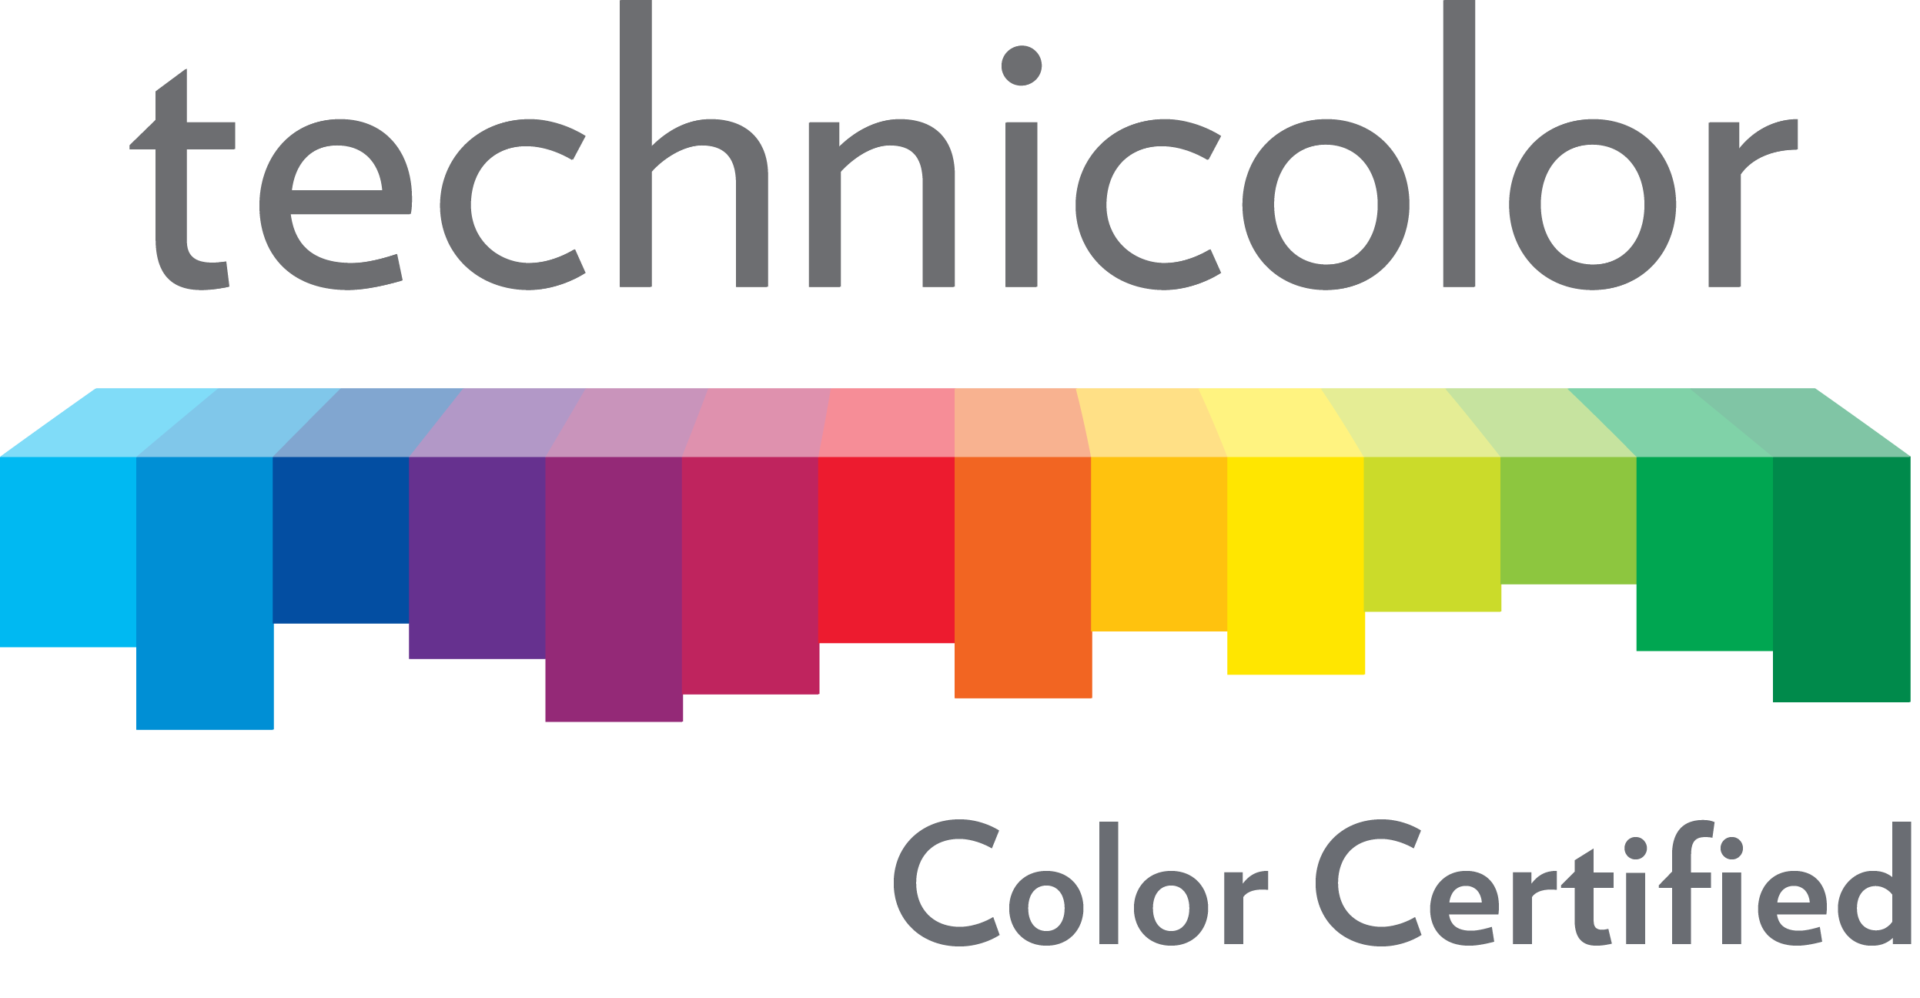 logo_technicolor_color_certified